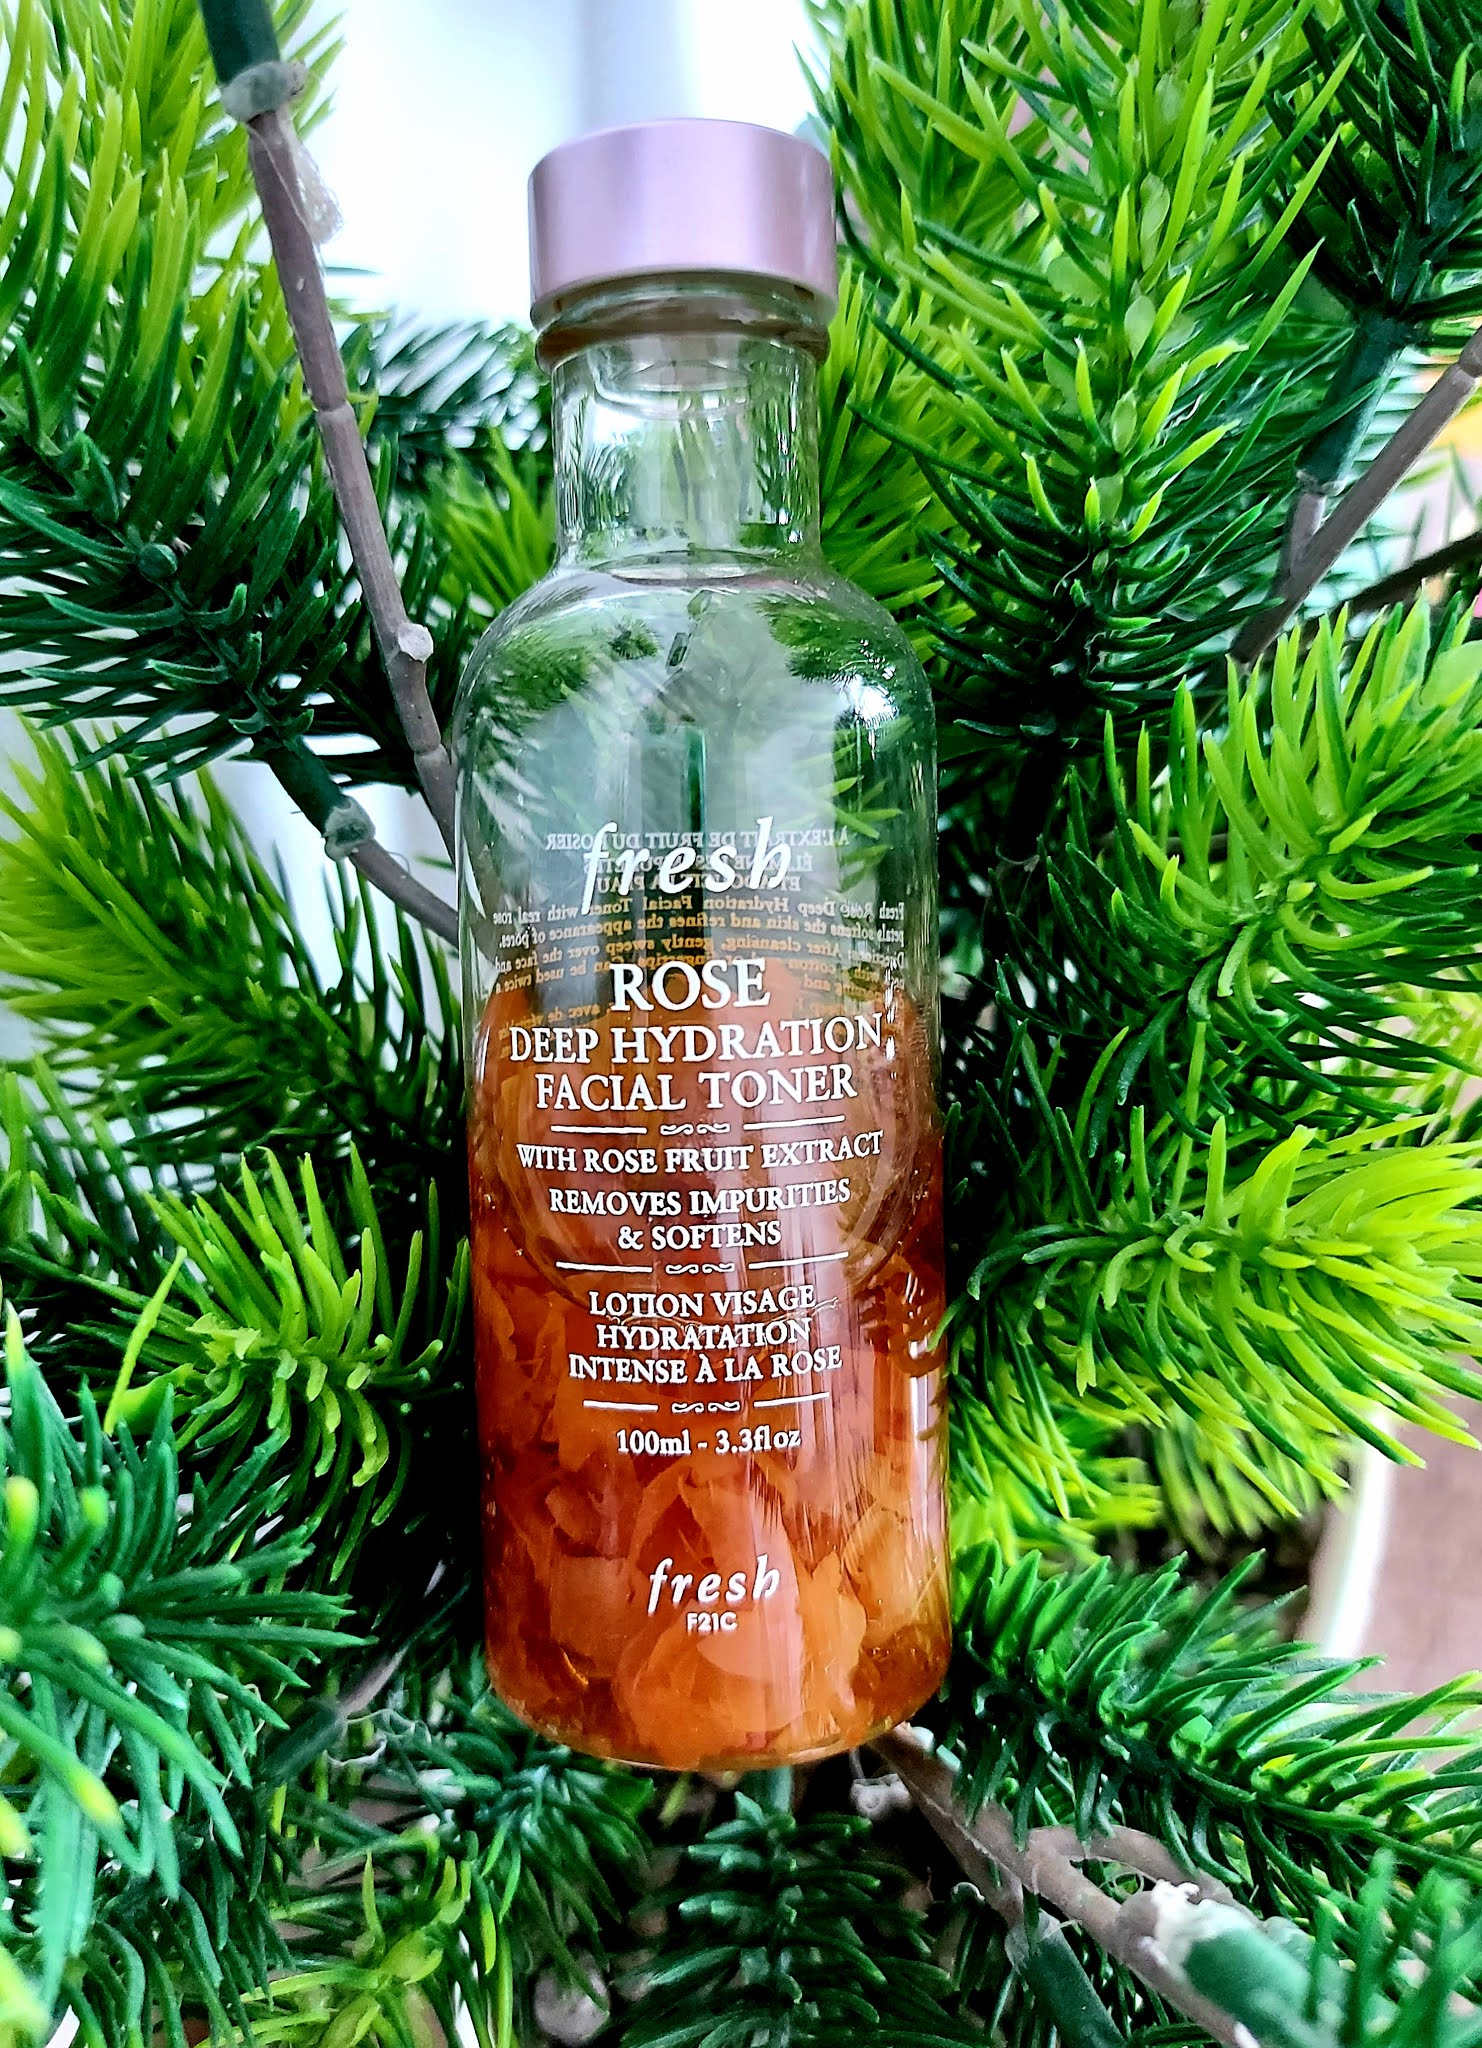 Rose Deep Hydration Facial Toner - tonik z platkami róż od marki Fresh Aneta Lason Beauty Talks